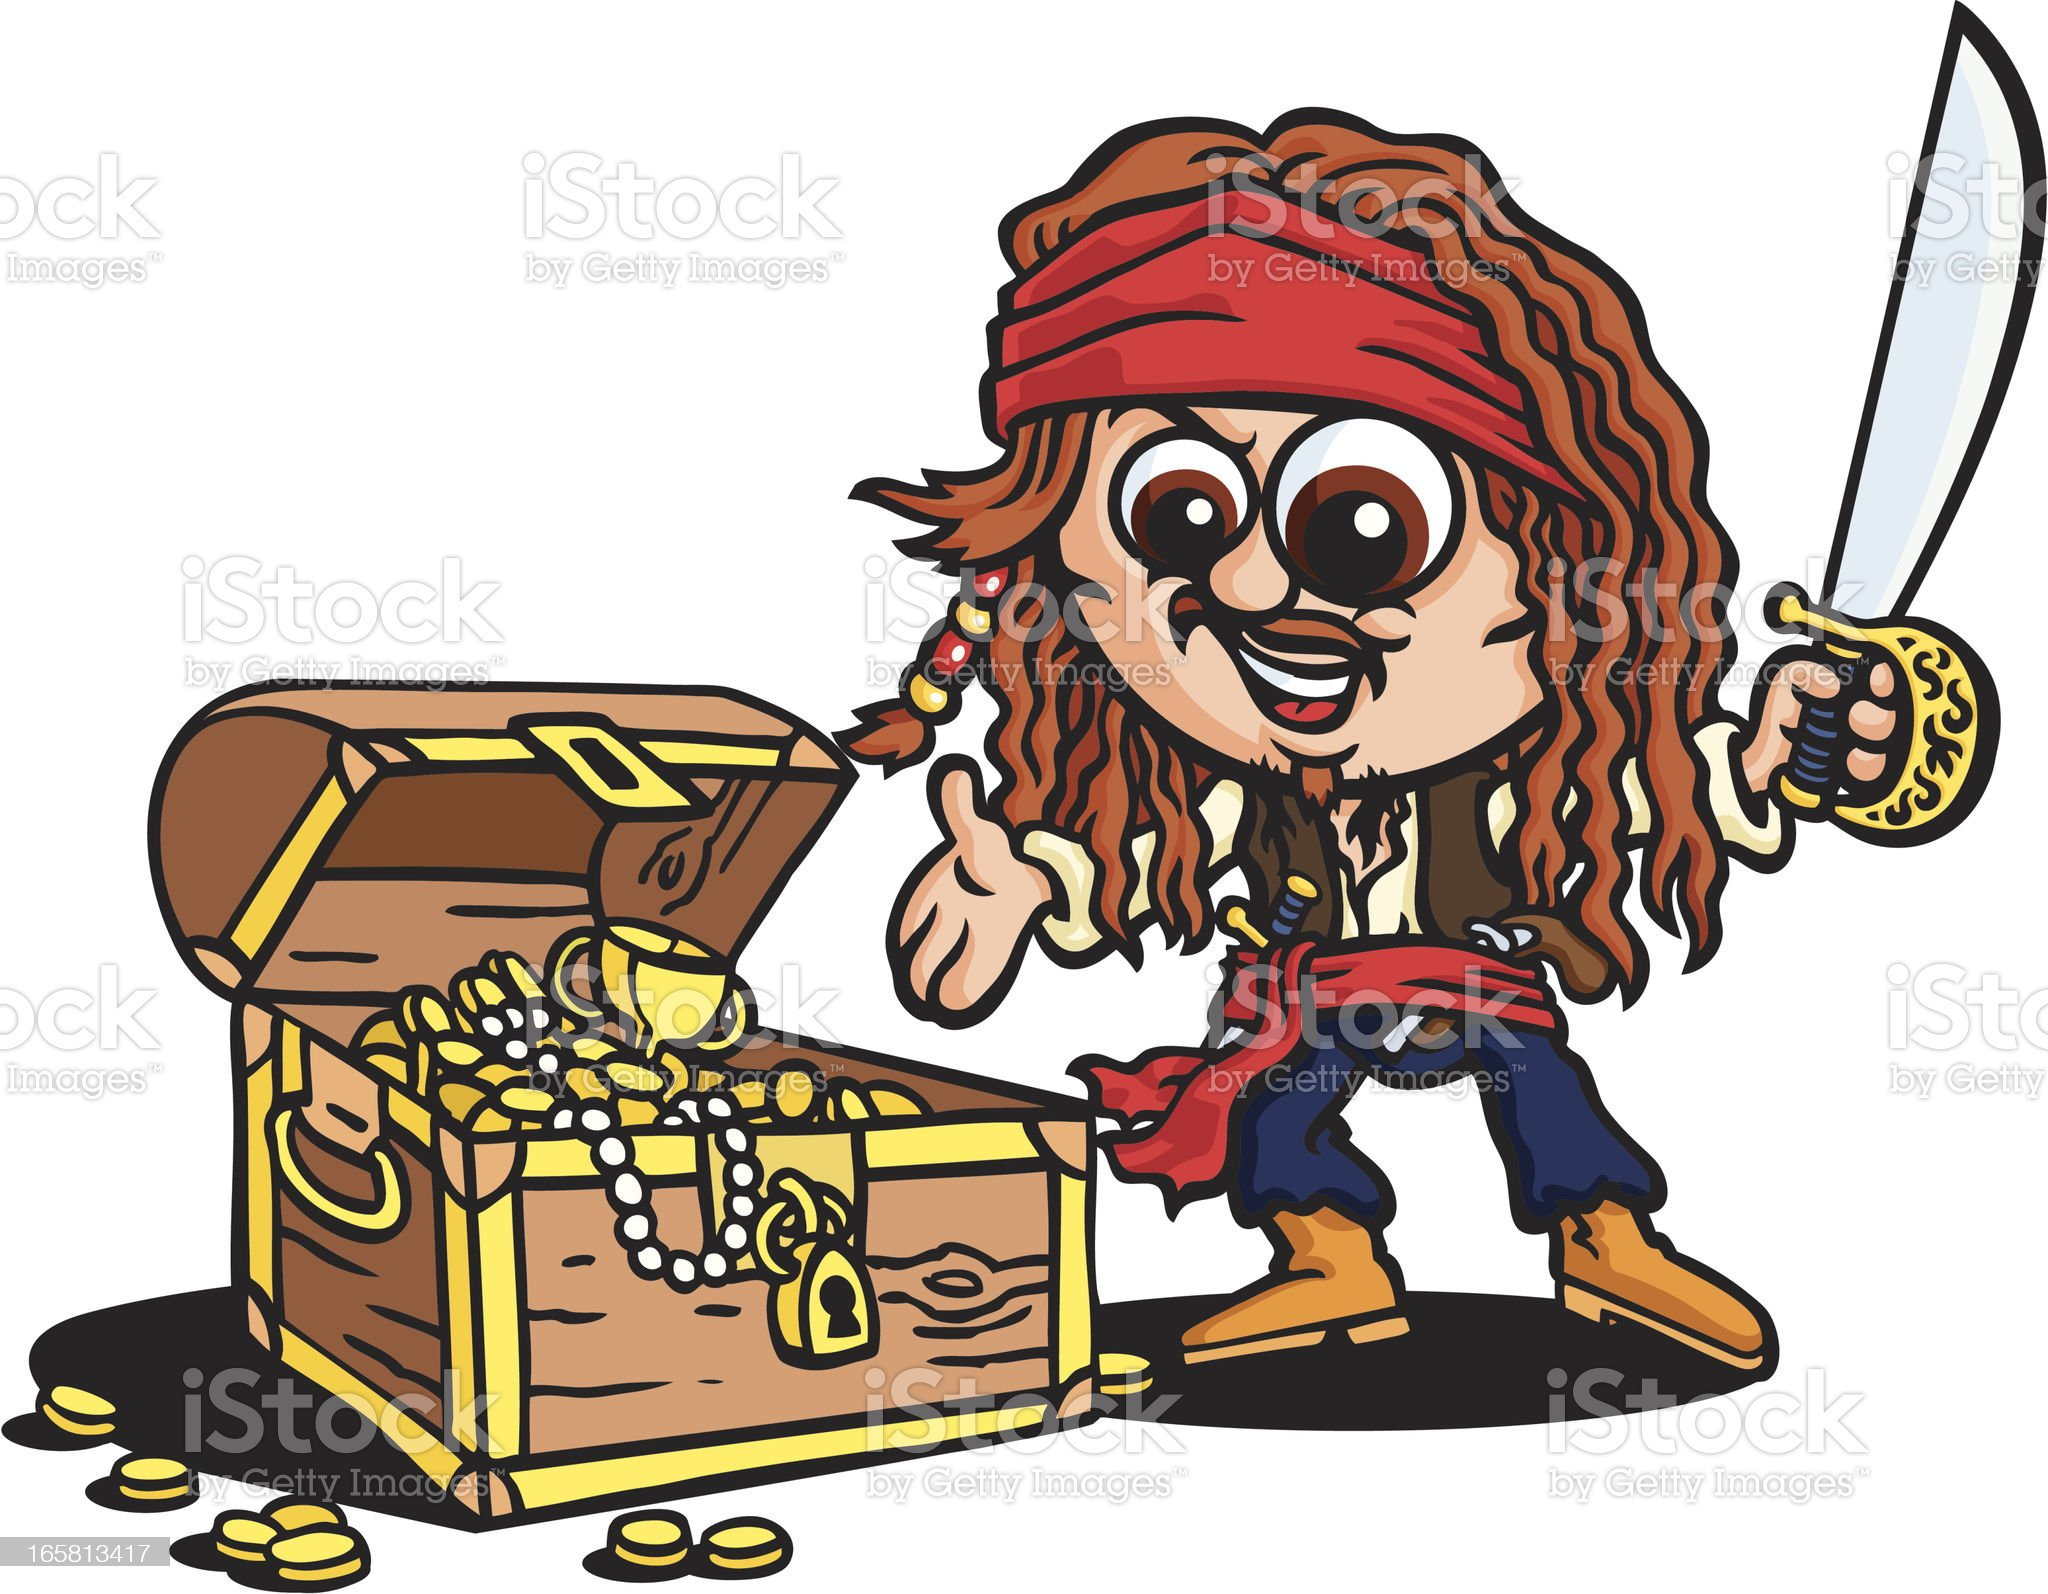 Pirate's Treasure royalty-free stock vector art